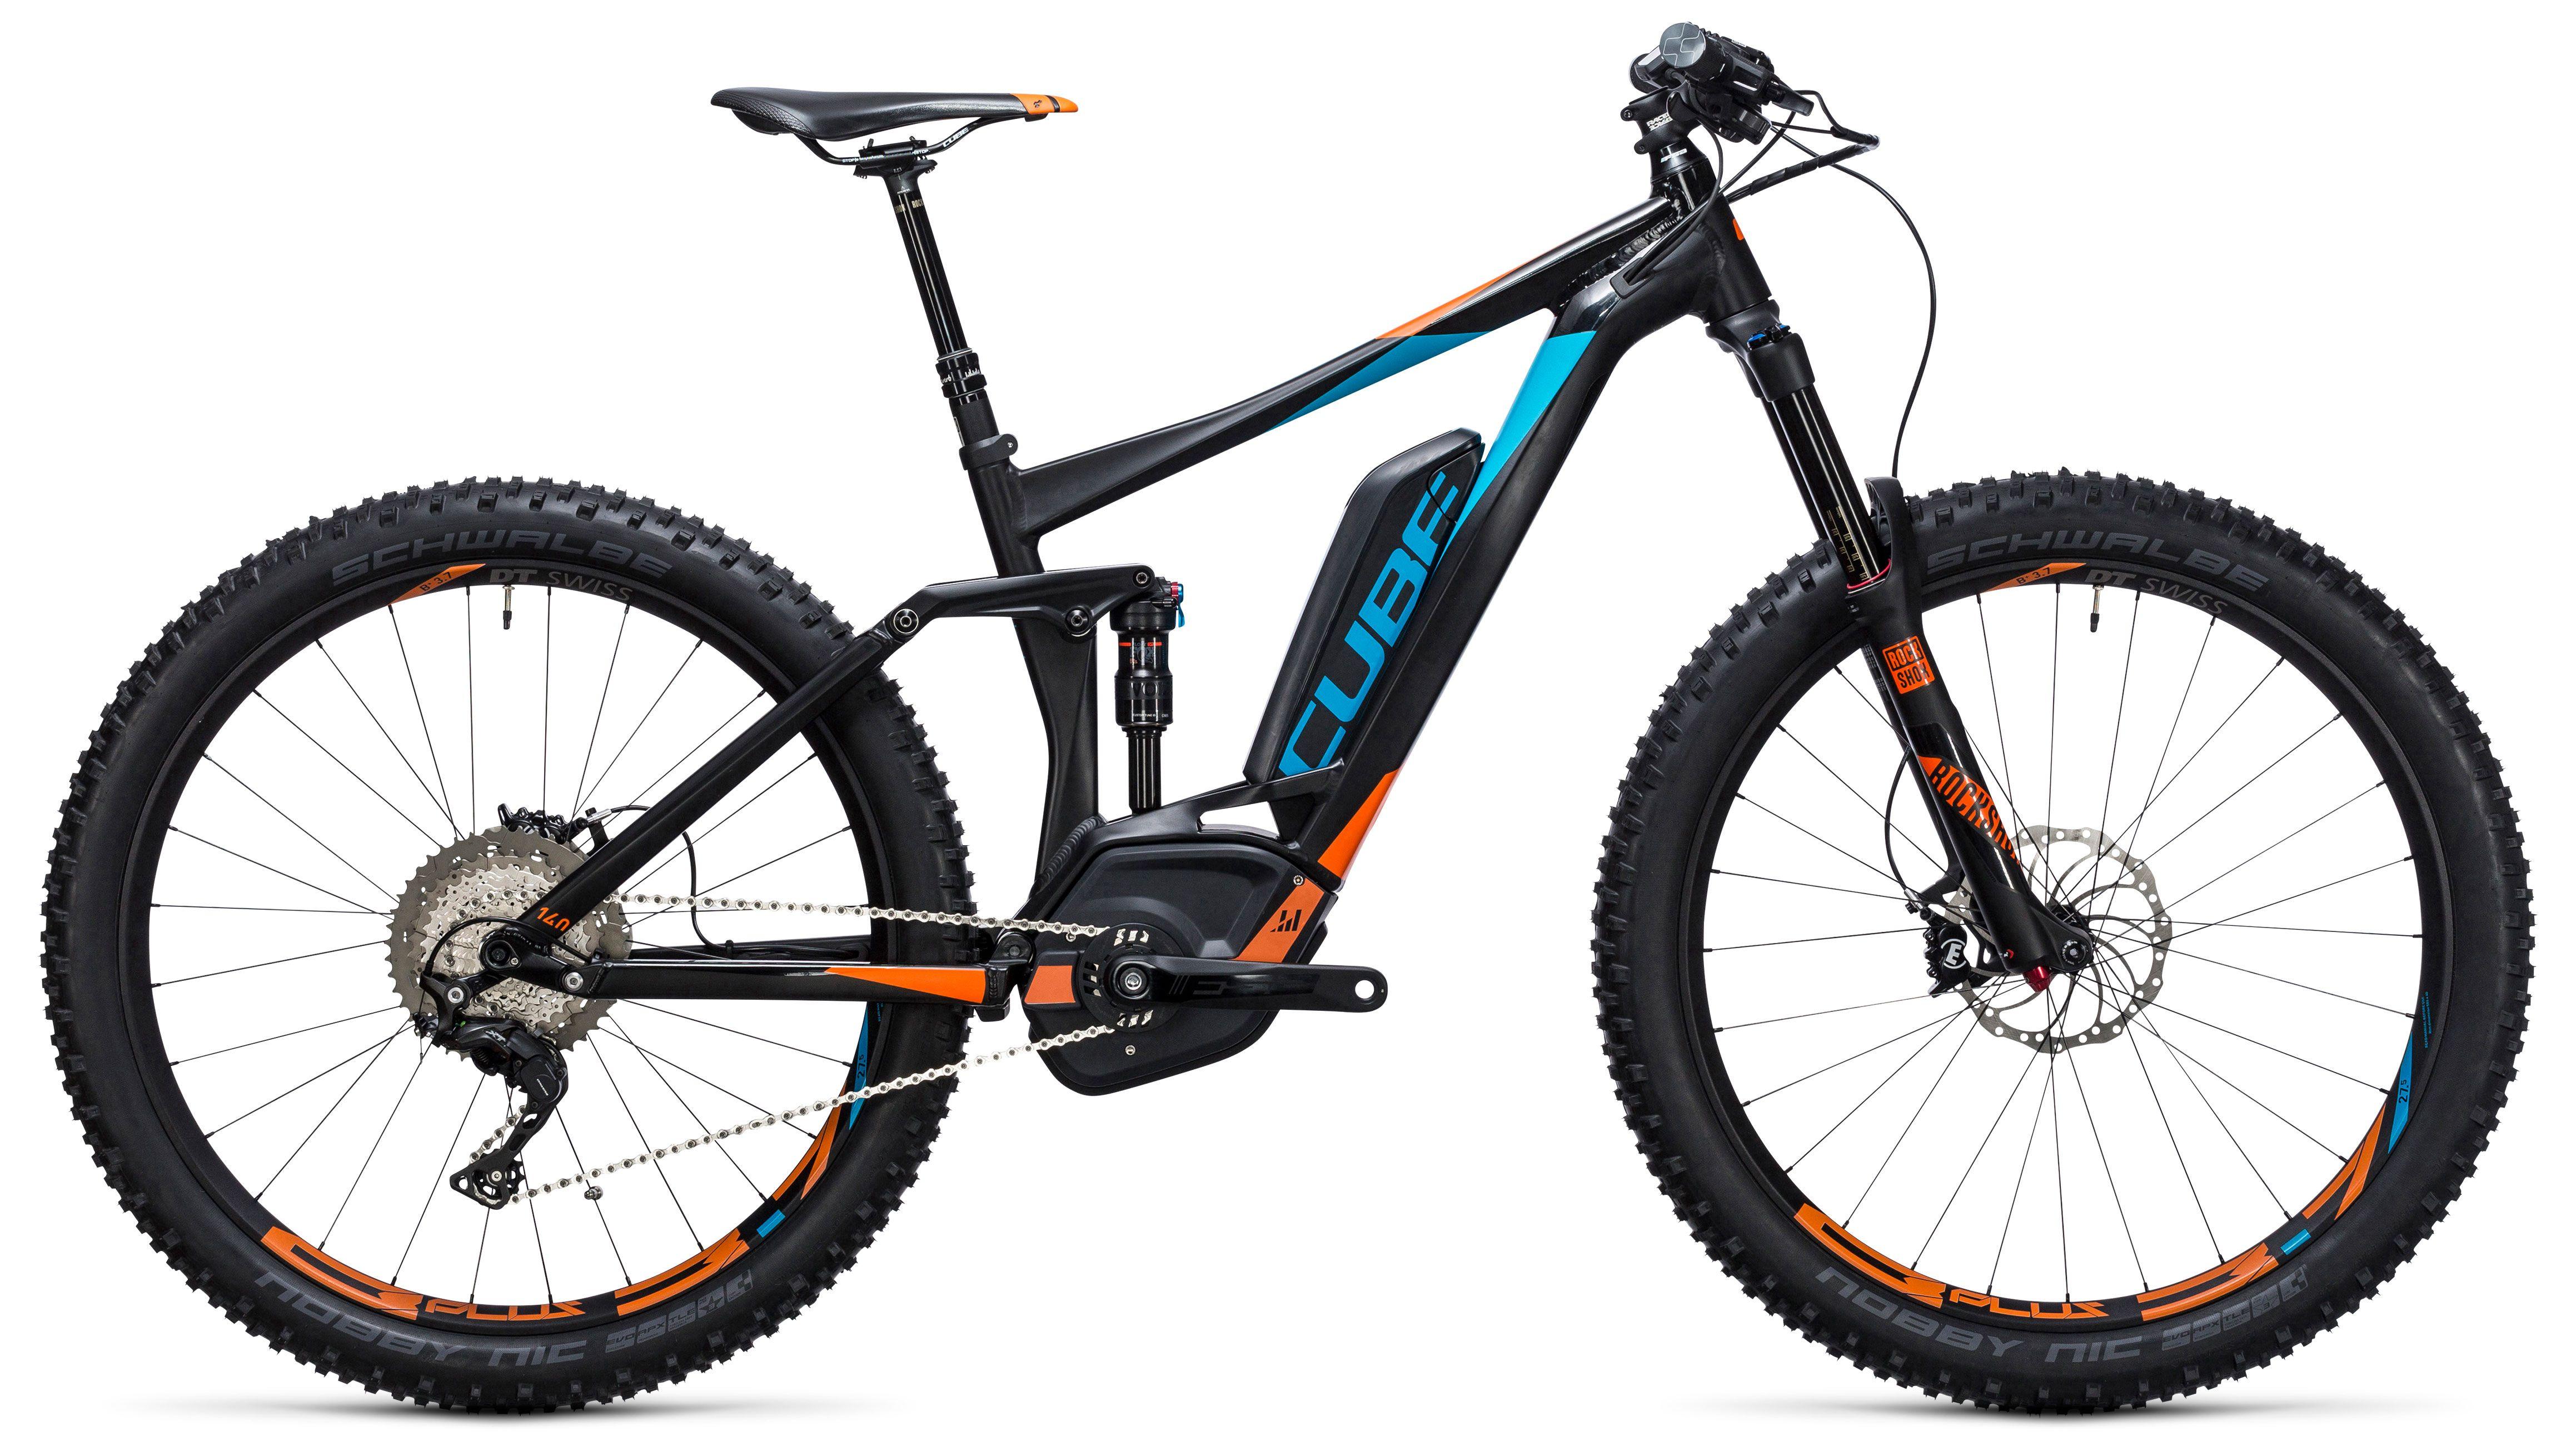 Велосипед Cube Stereo Hybrid 140 HPA SL 500 27.5+ 2017,  Двухподвесы  - артикул:272702